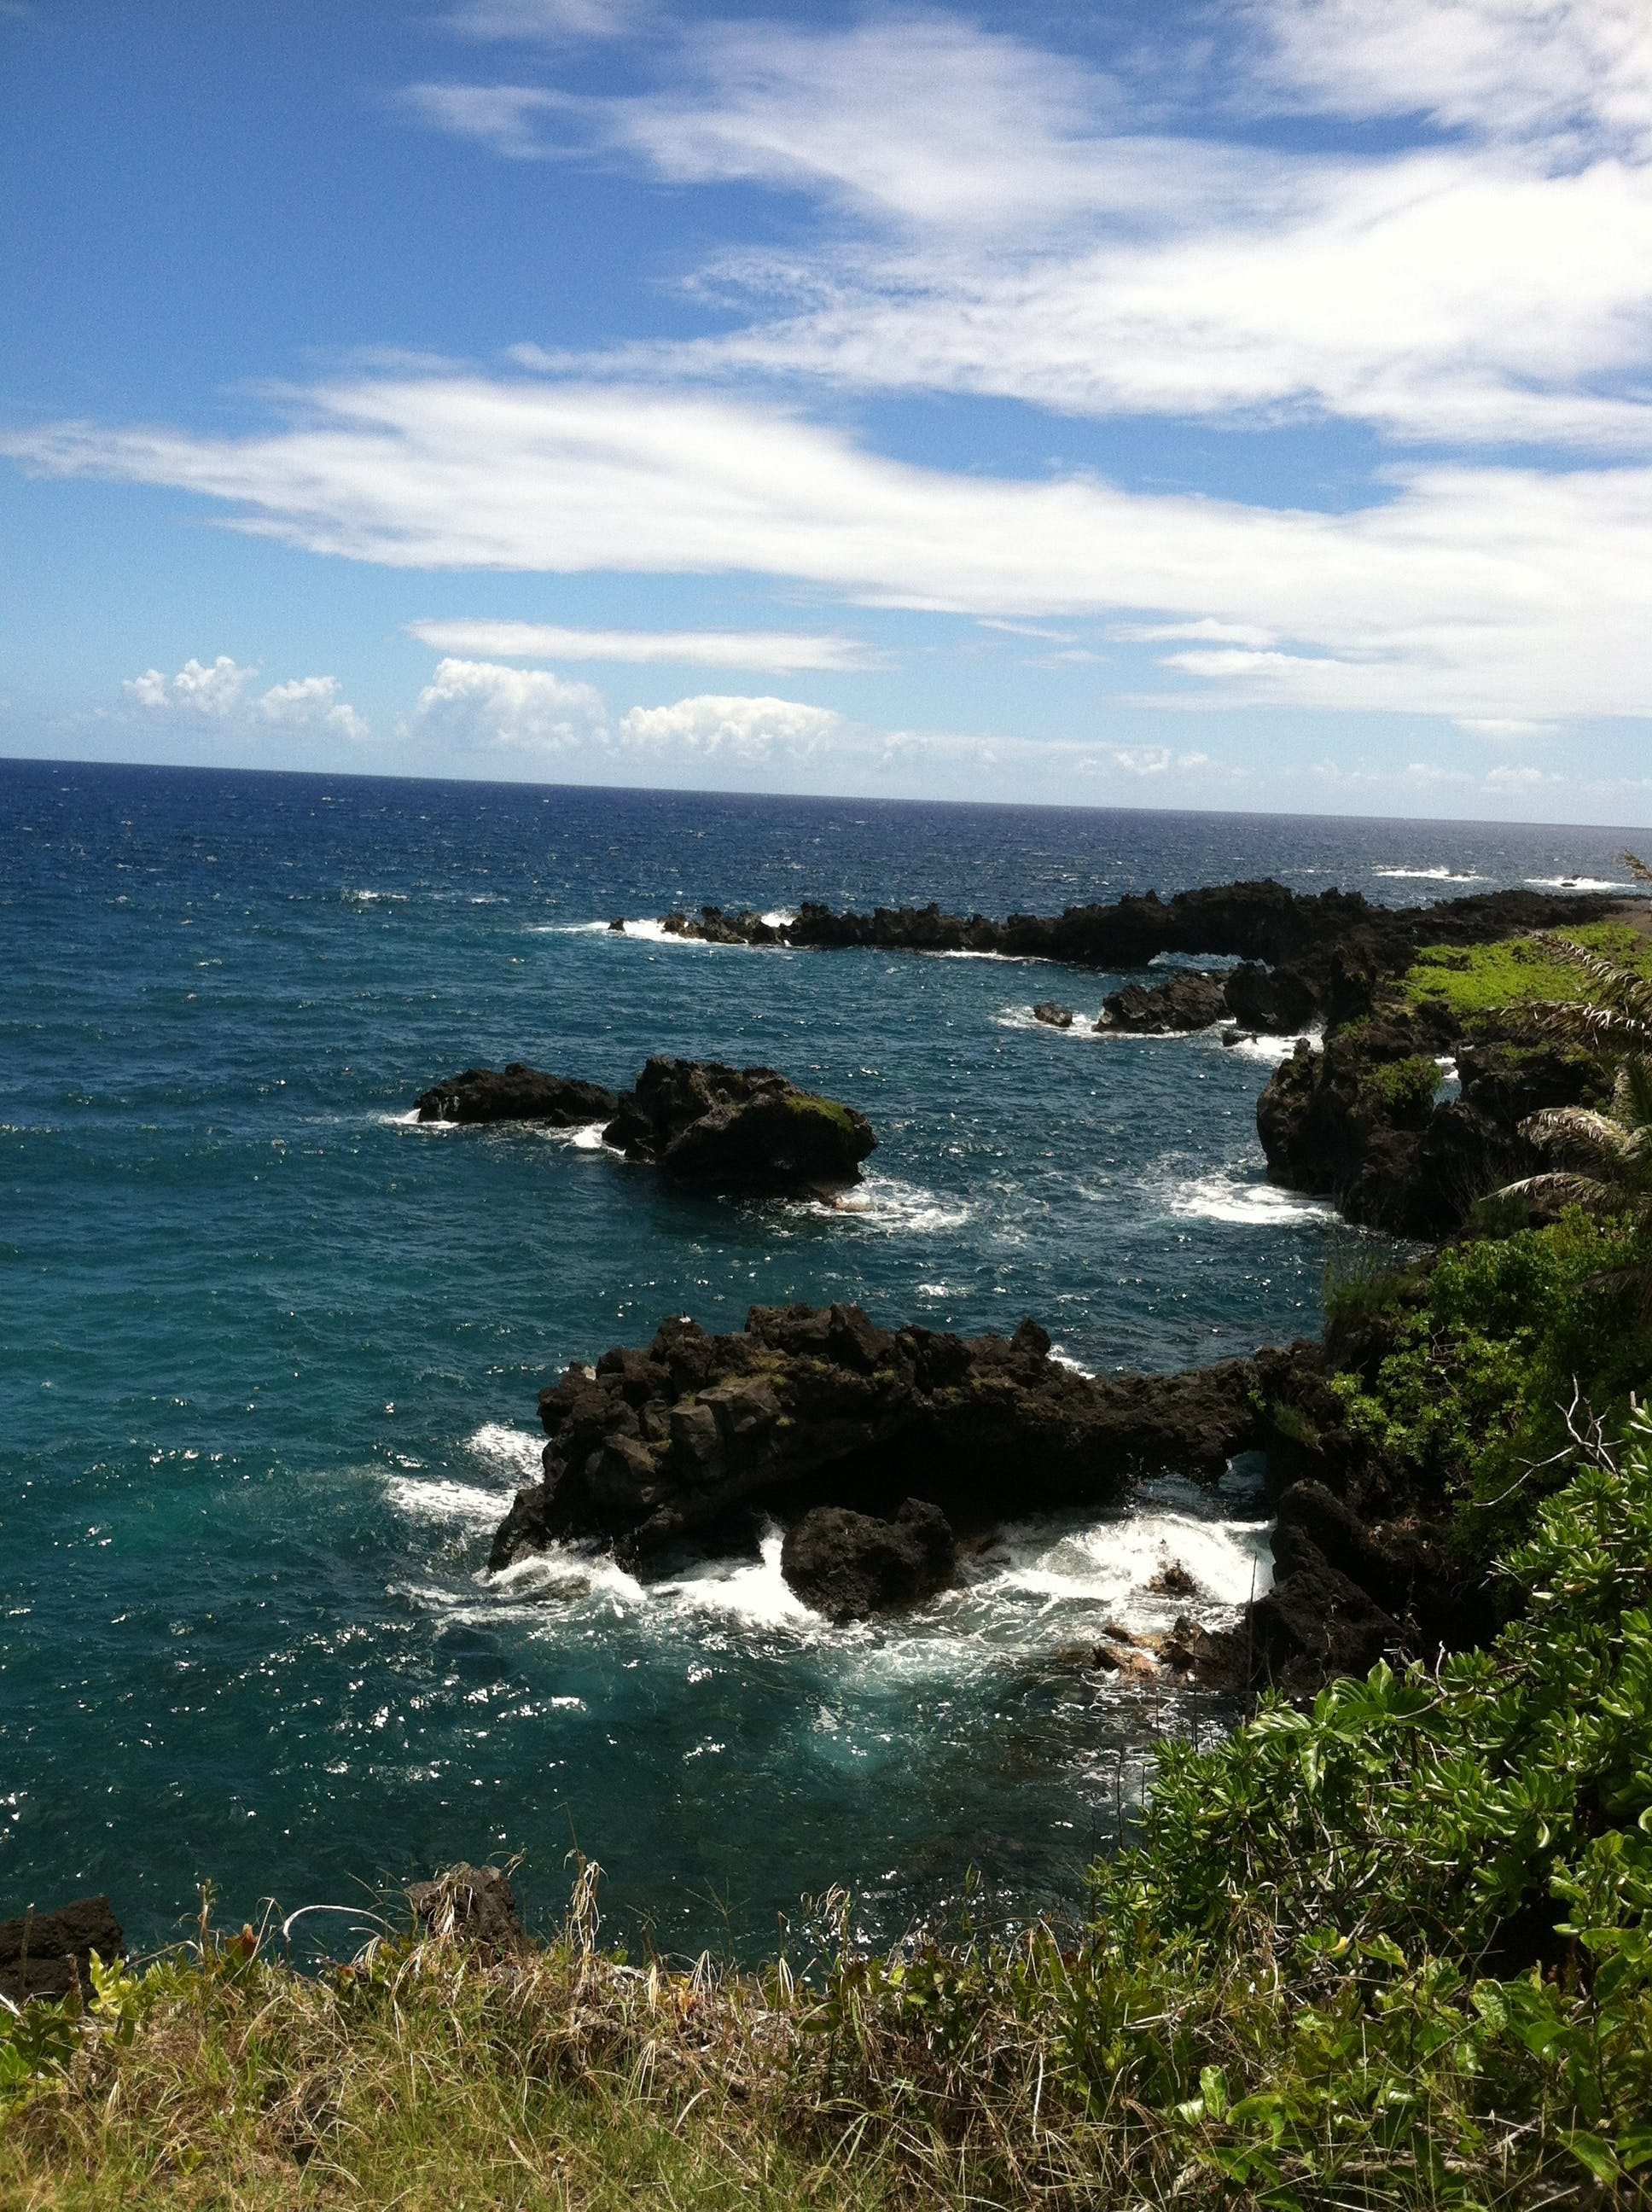 Free stock photo of Blue ocean